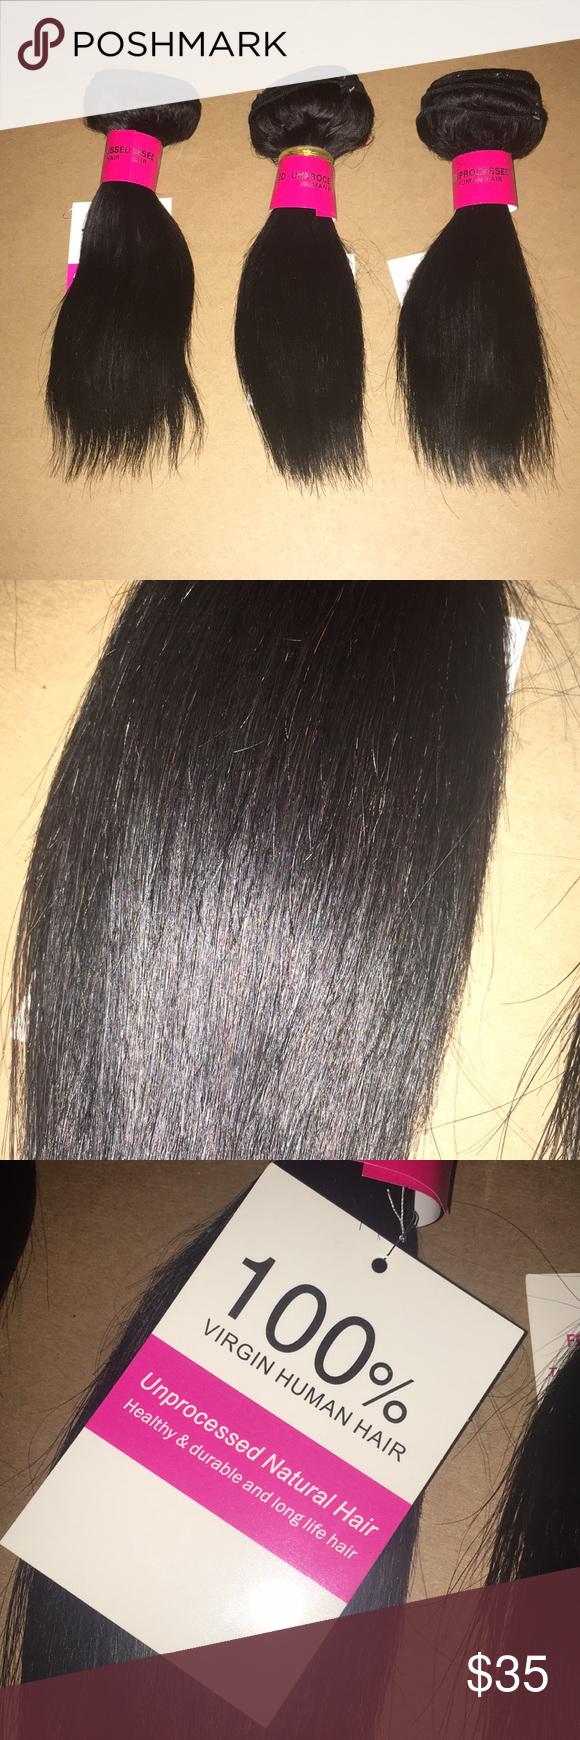 bundles ud peruvian straight hair straight hair washing dryer